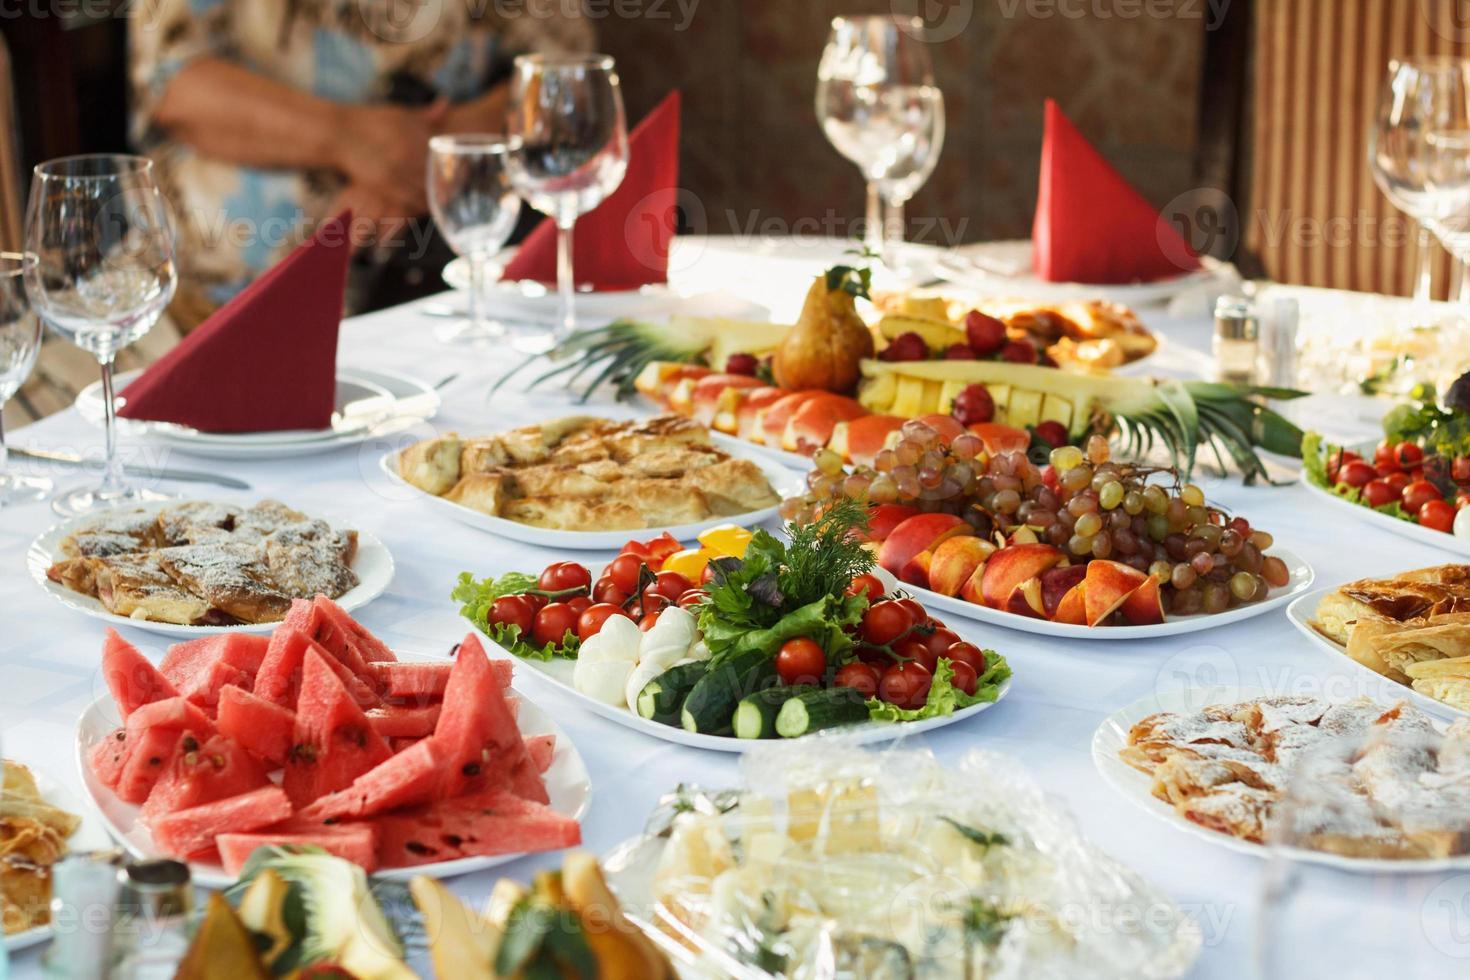 comemorar mesa de banquete com comida foto